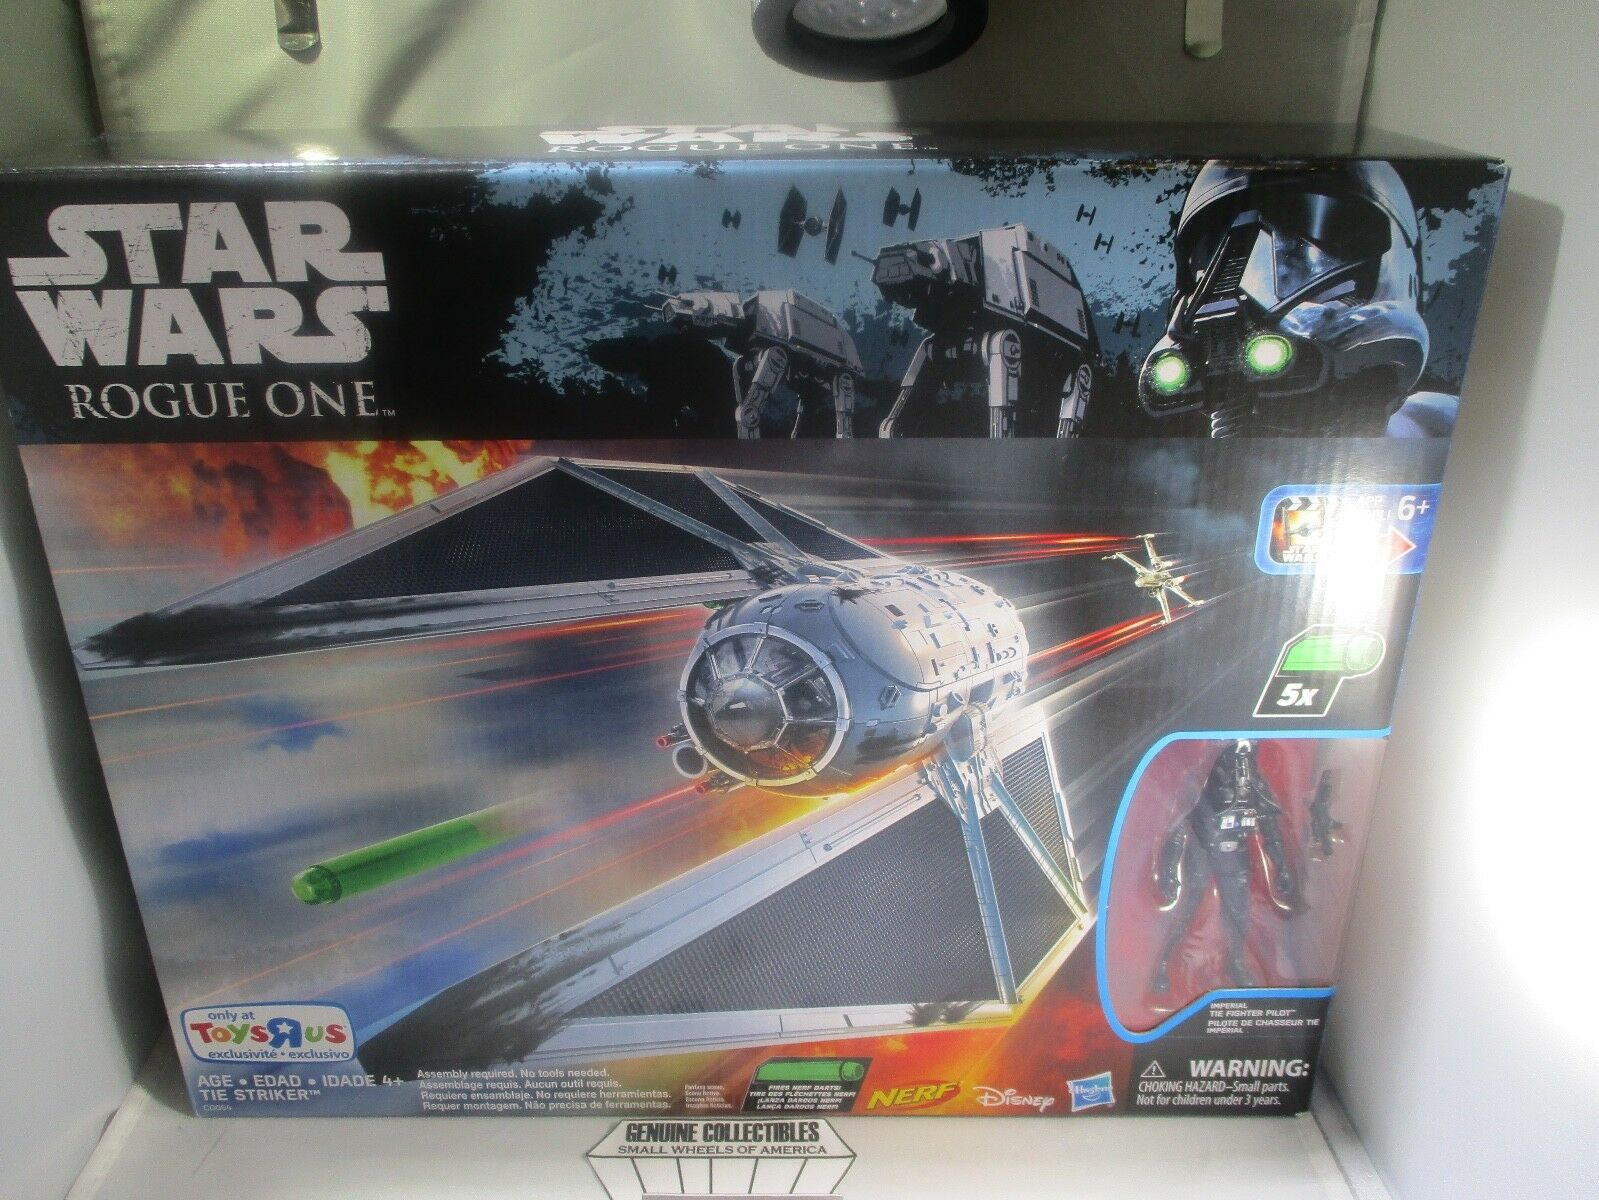 NEW  Star Wars Rogue One TIE STRIKER+Imperial Tie Fighter Pilot Action Figure